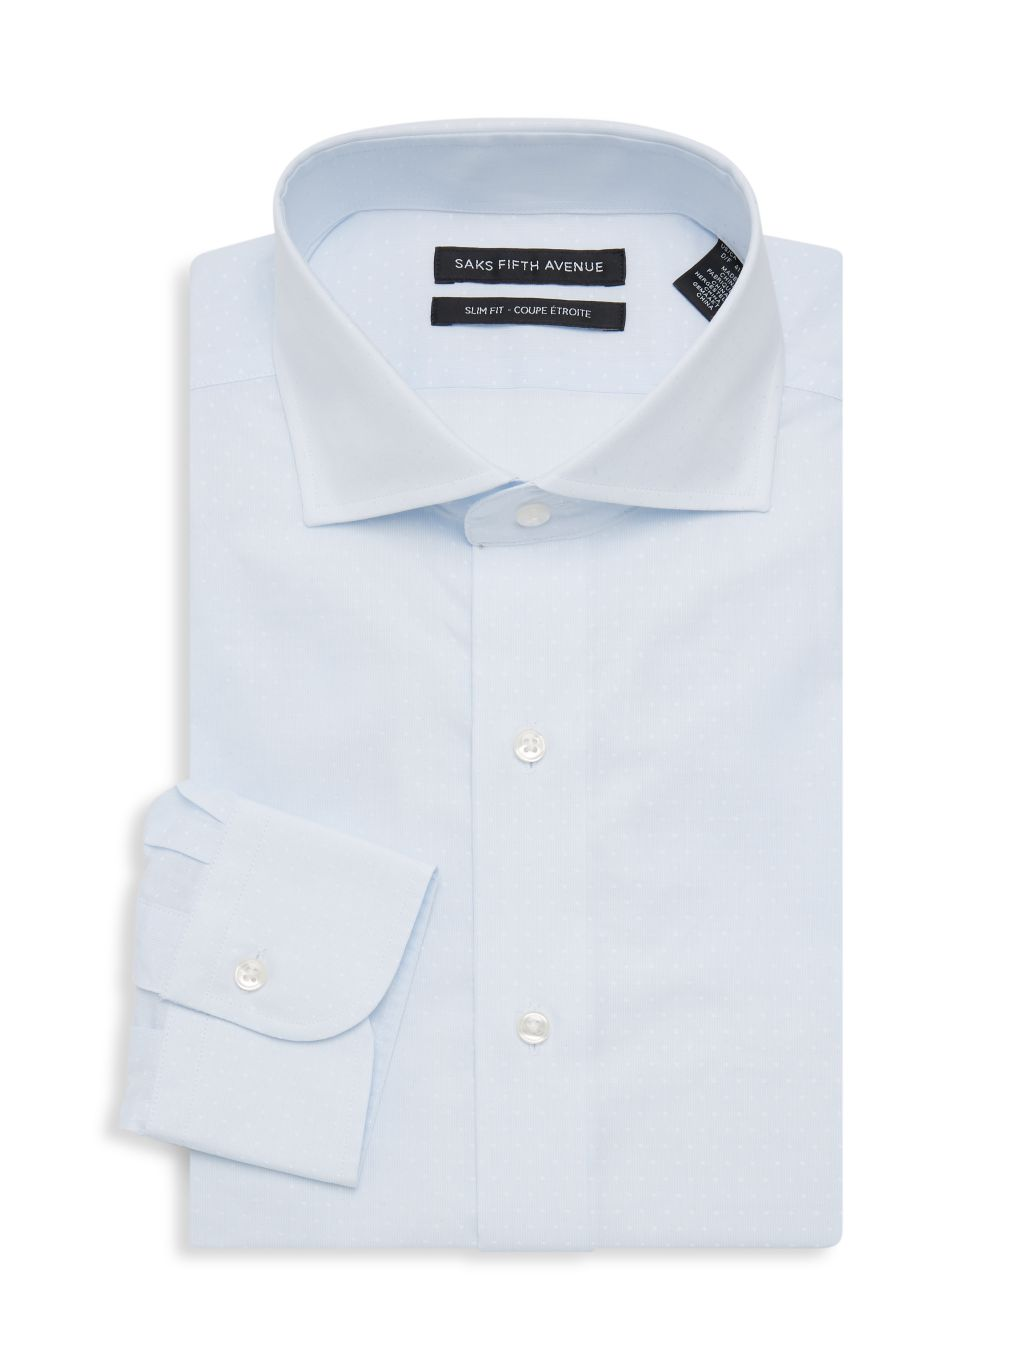 Saks Fifth Avenue Slim-Fit Printed Dress Shirt